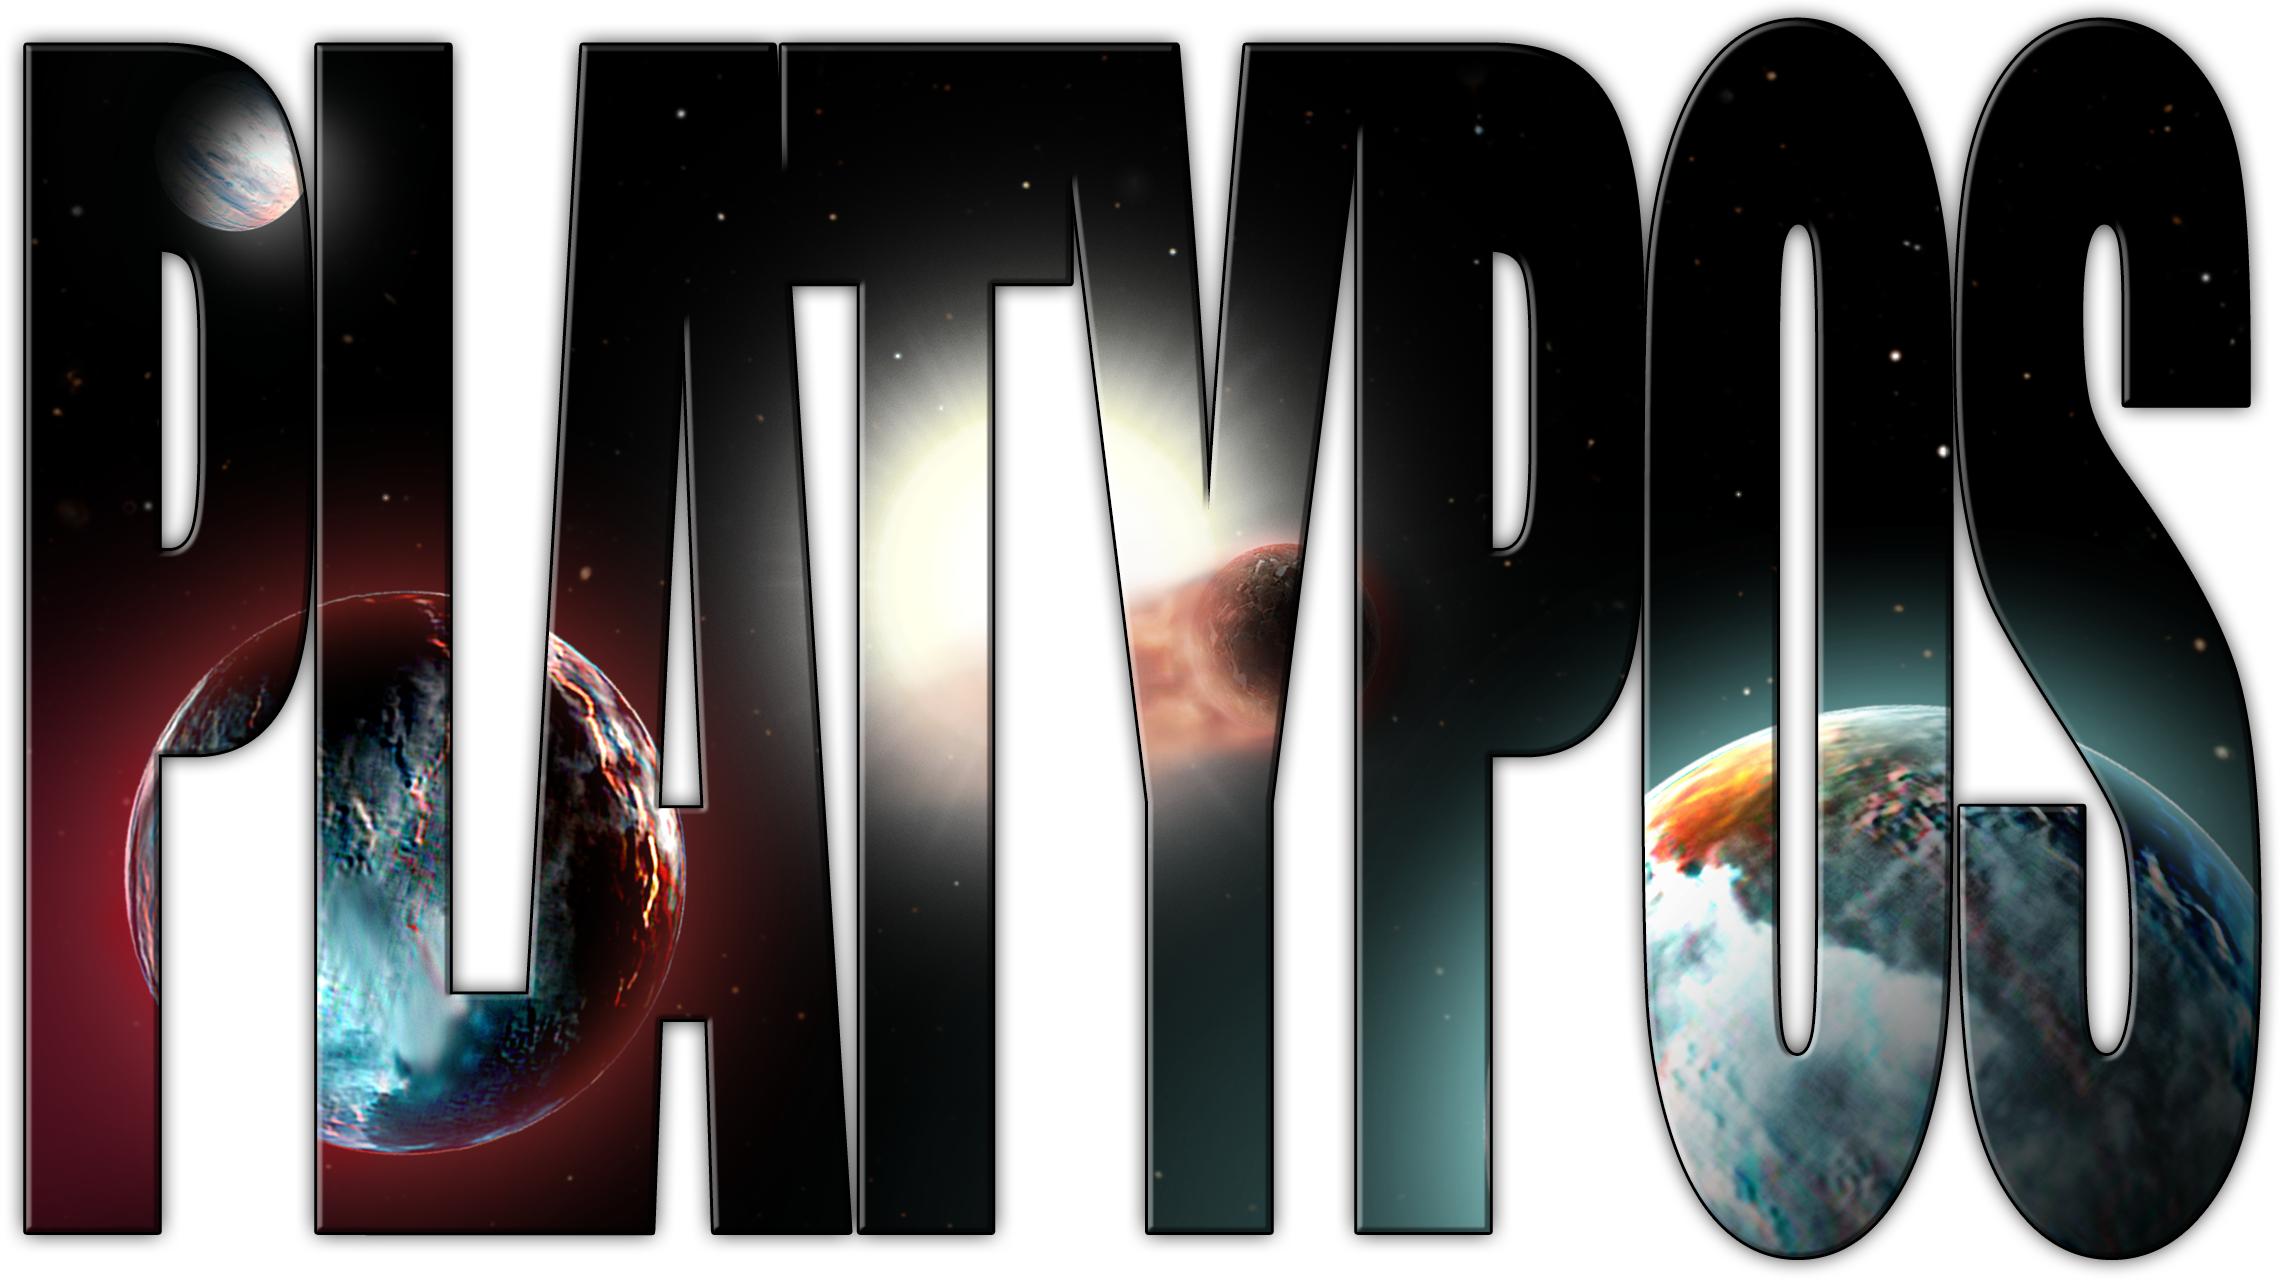 supplementary_files/an_Laura_Ketzer_PLATYPOS/platypos1.png